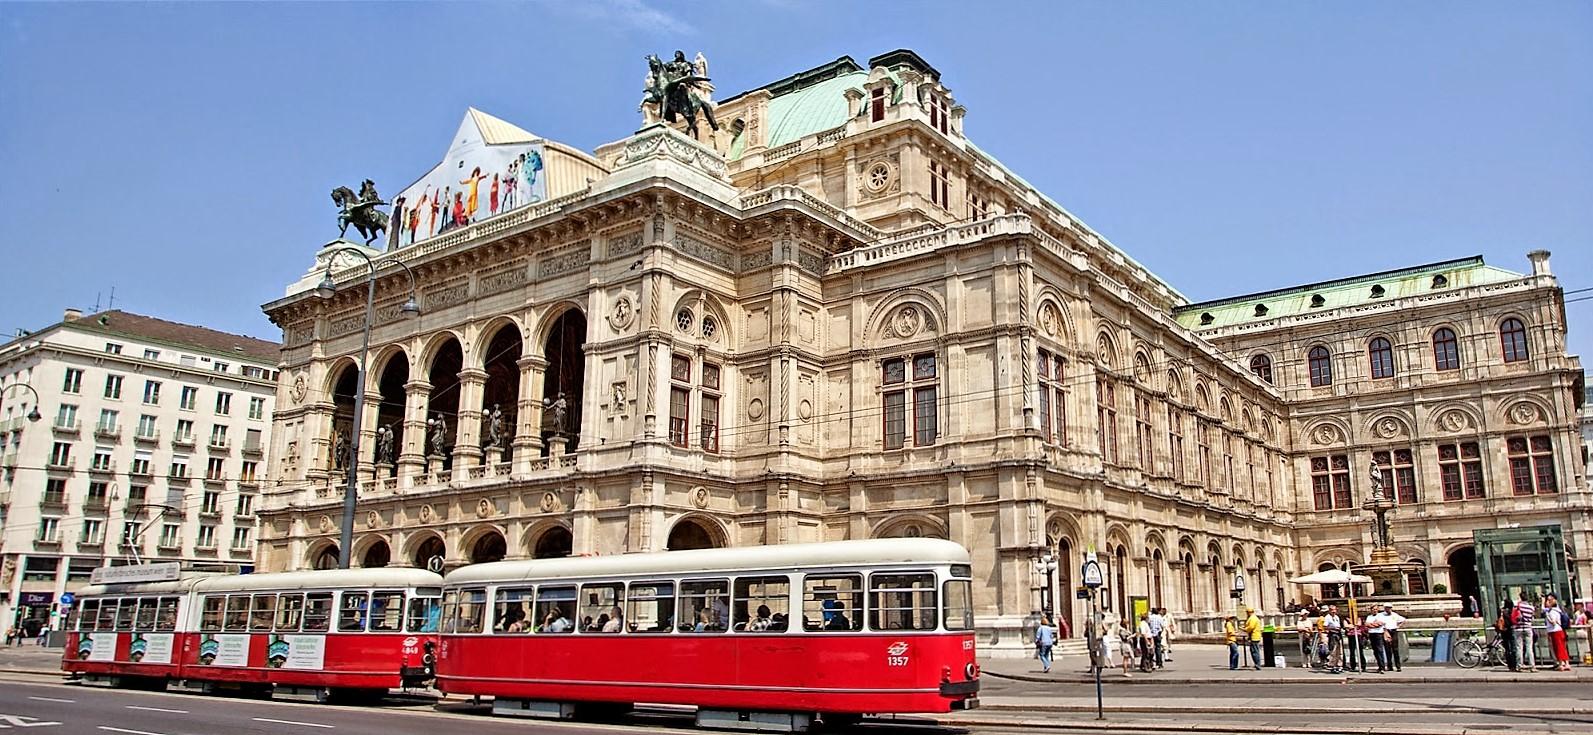 5 five 5 vienna state opera vienna austria. Black Bedroom Furniture Sets. Home Design Ideas